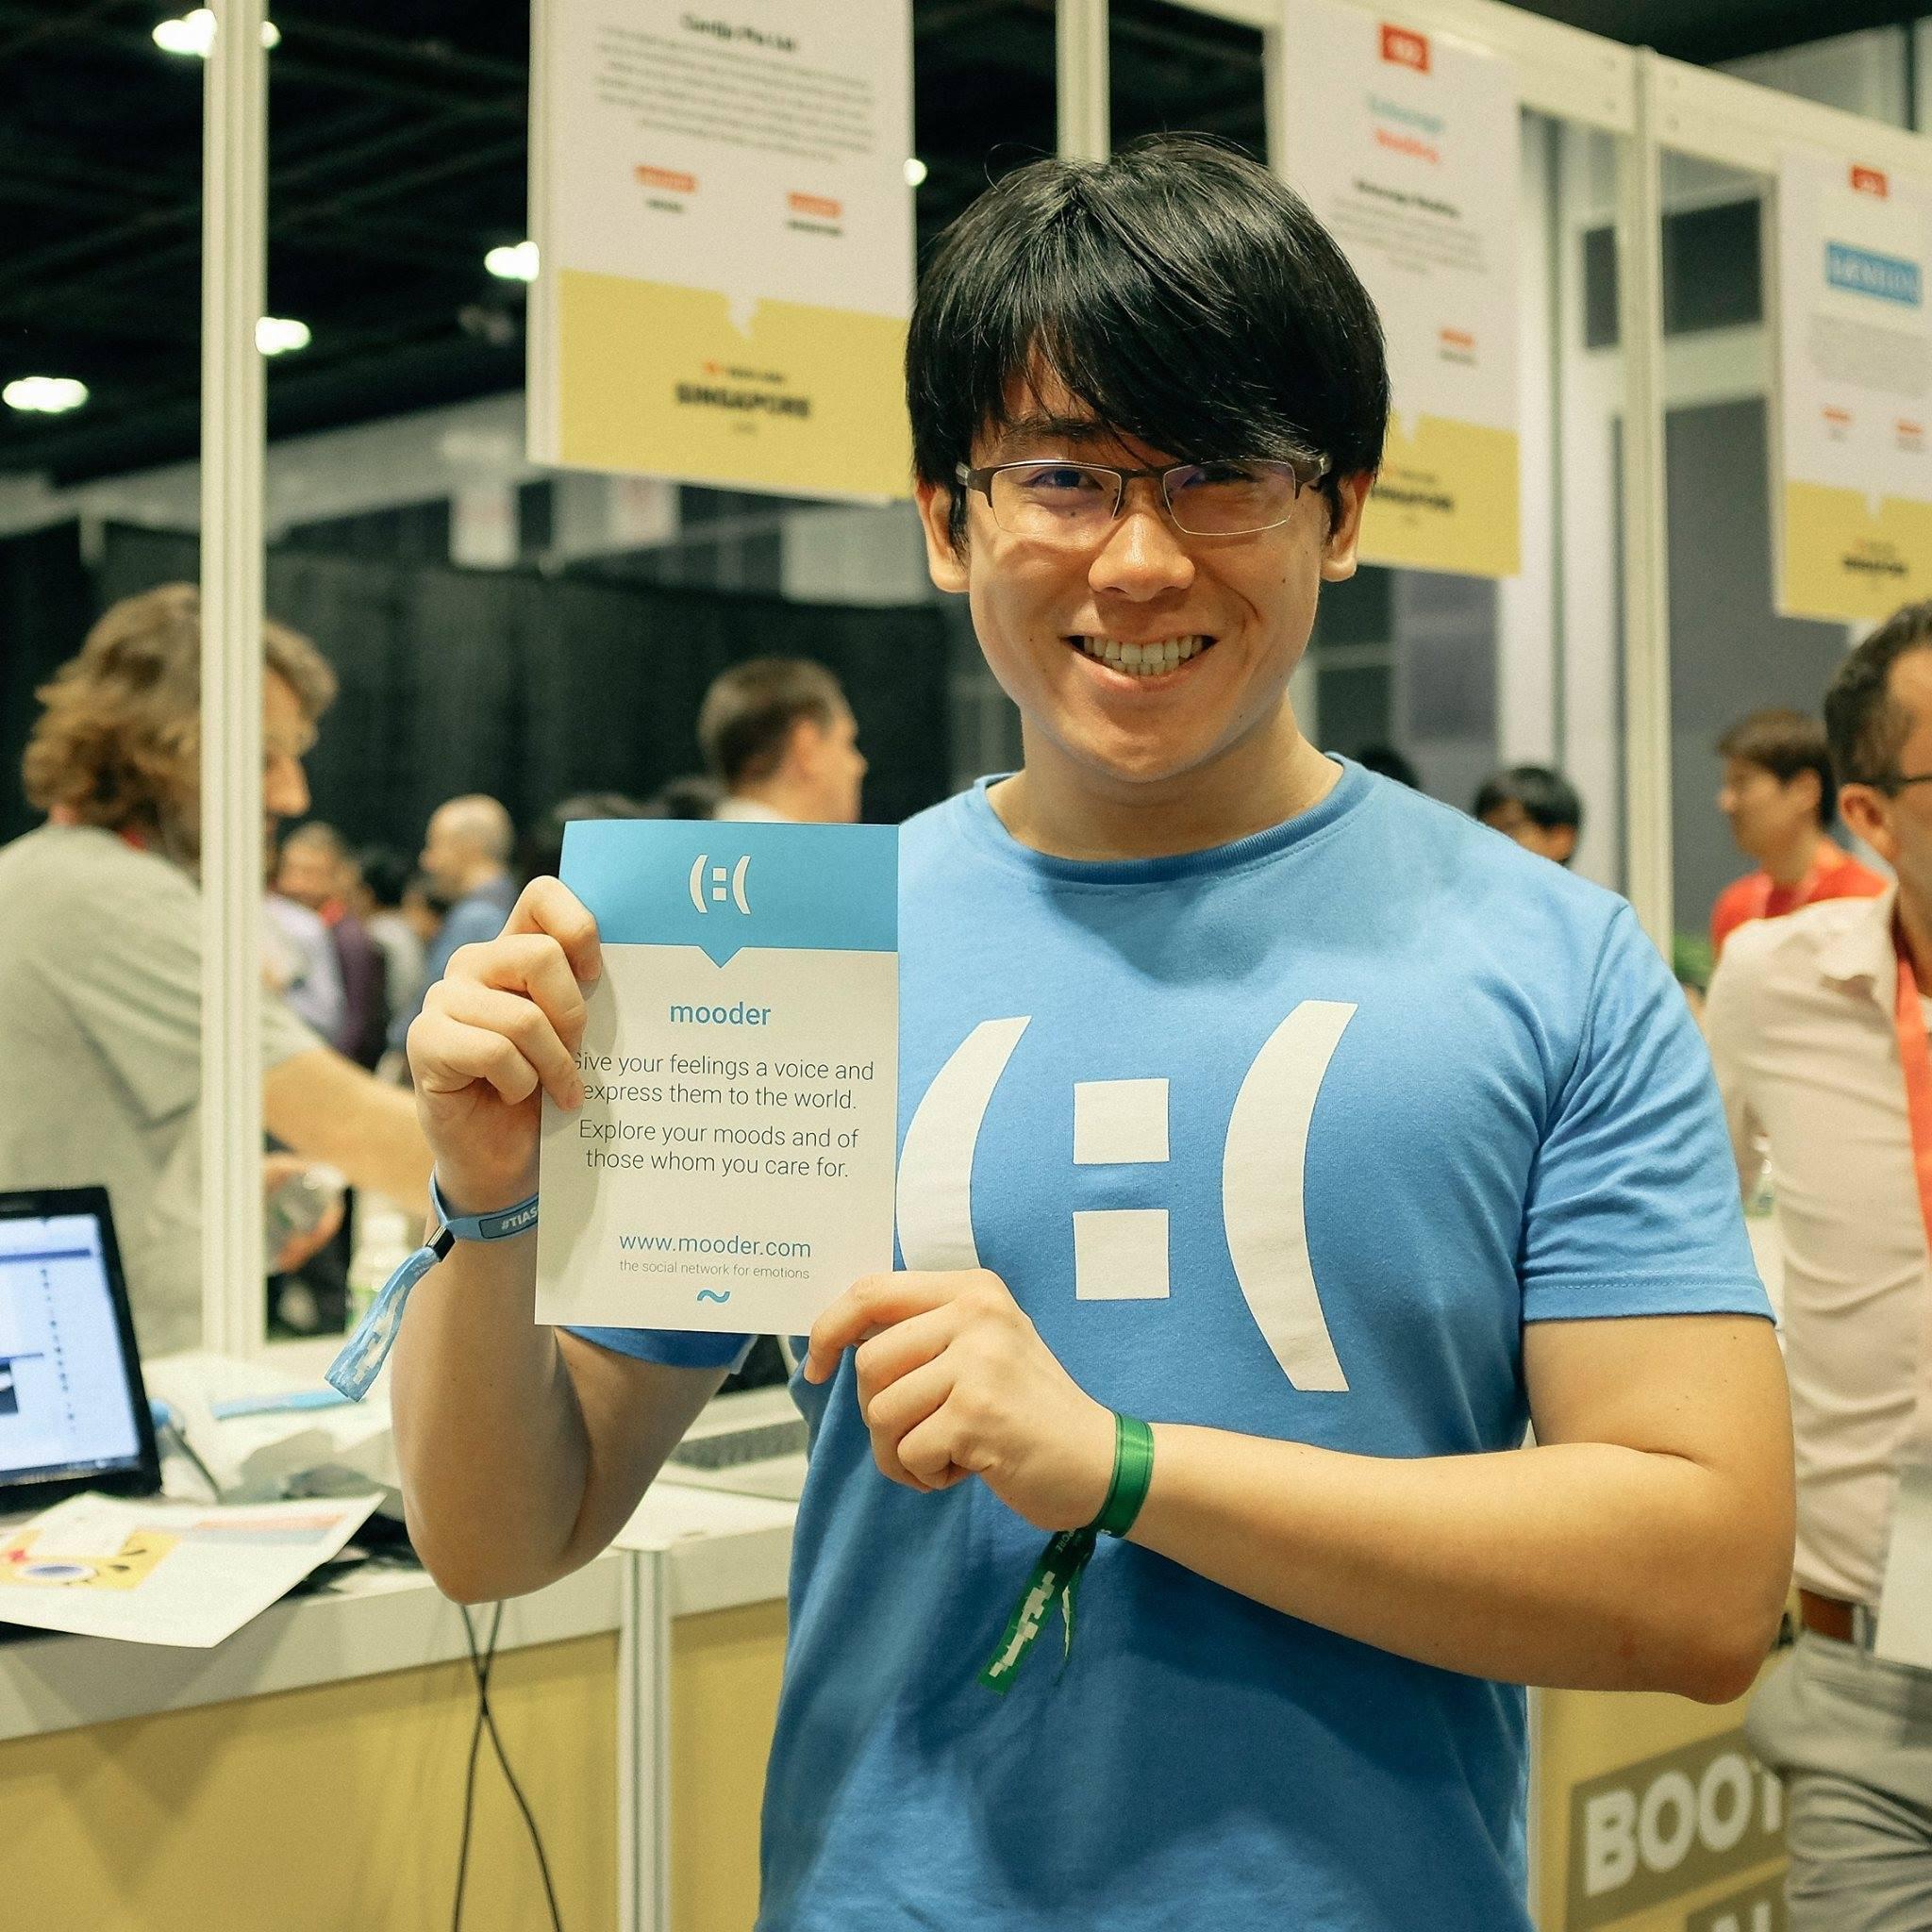 Tech_In_Asia-Mooder-Singapore-Jin_Zhe-April_2016